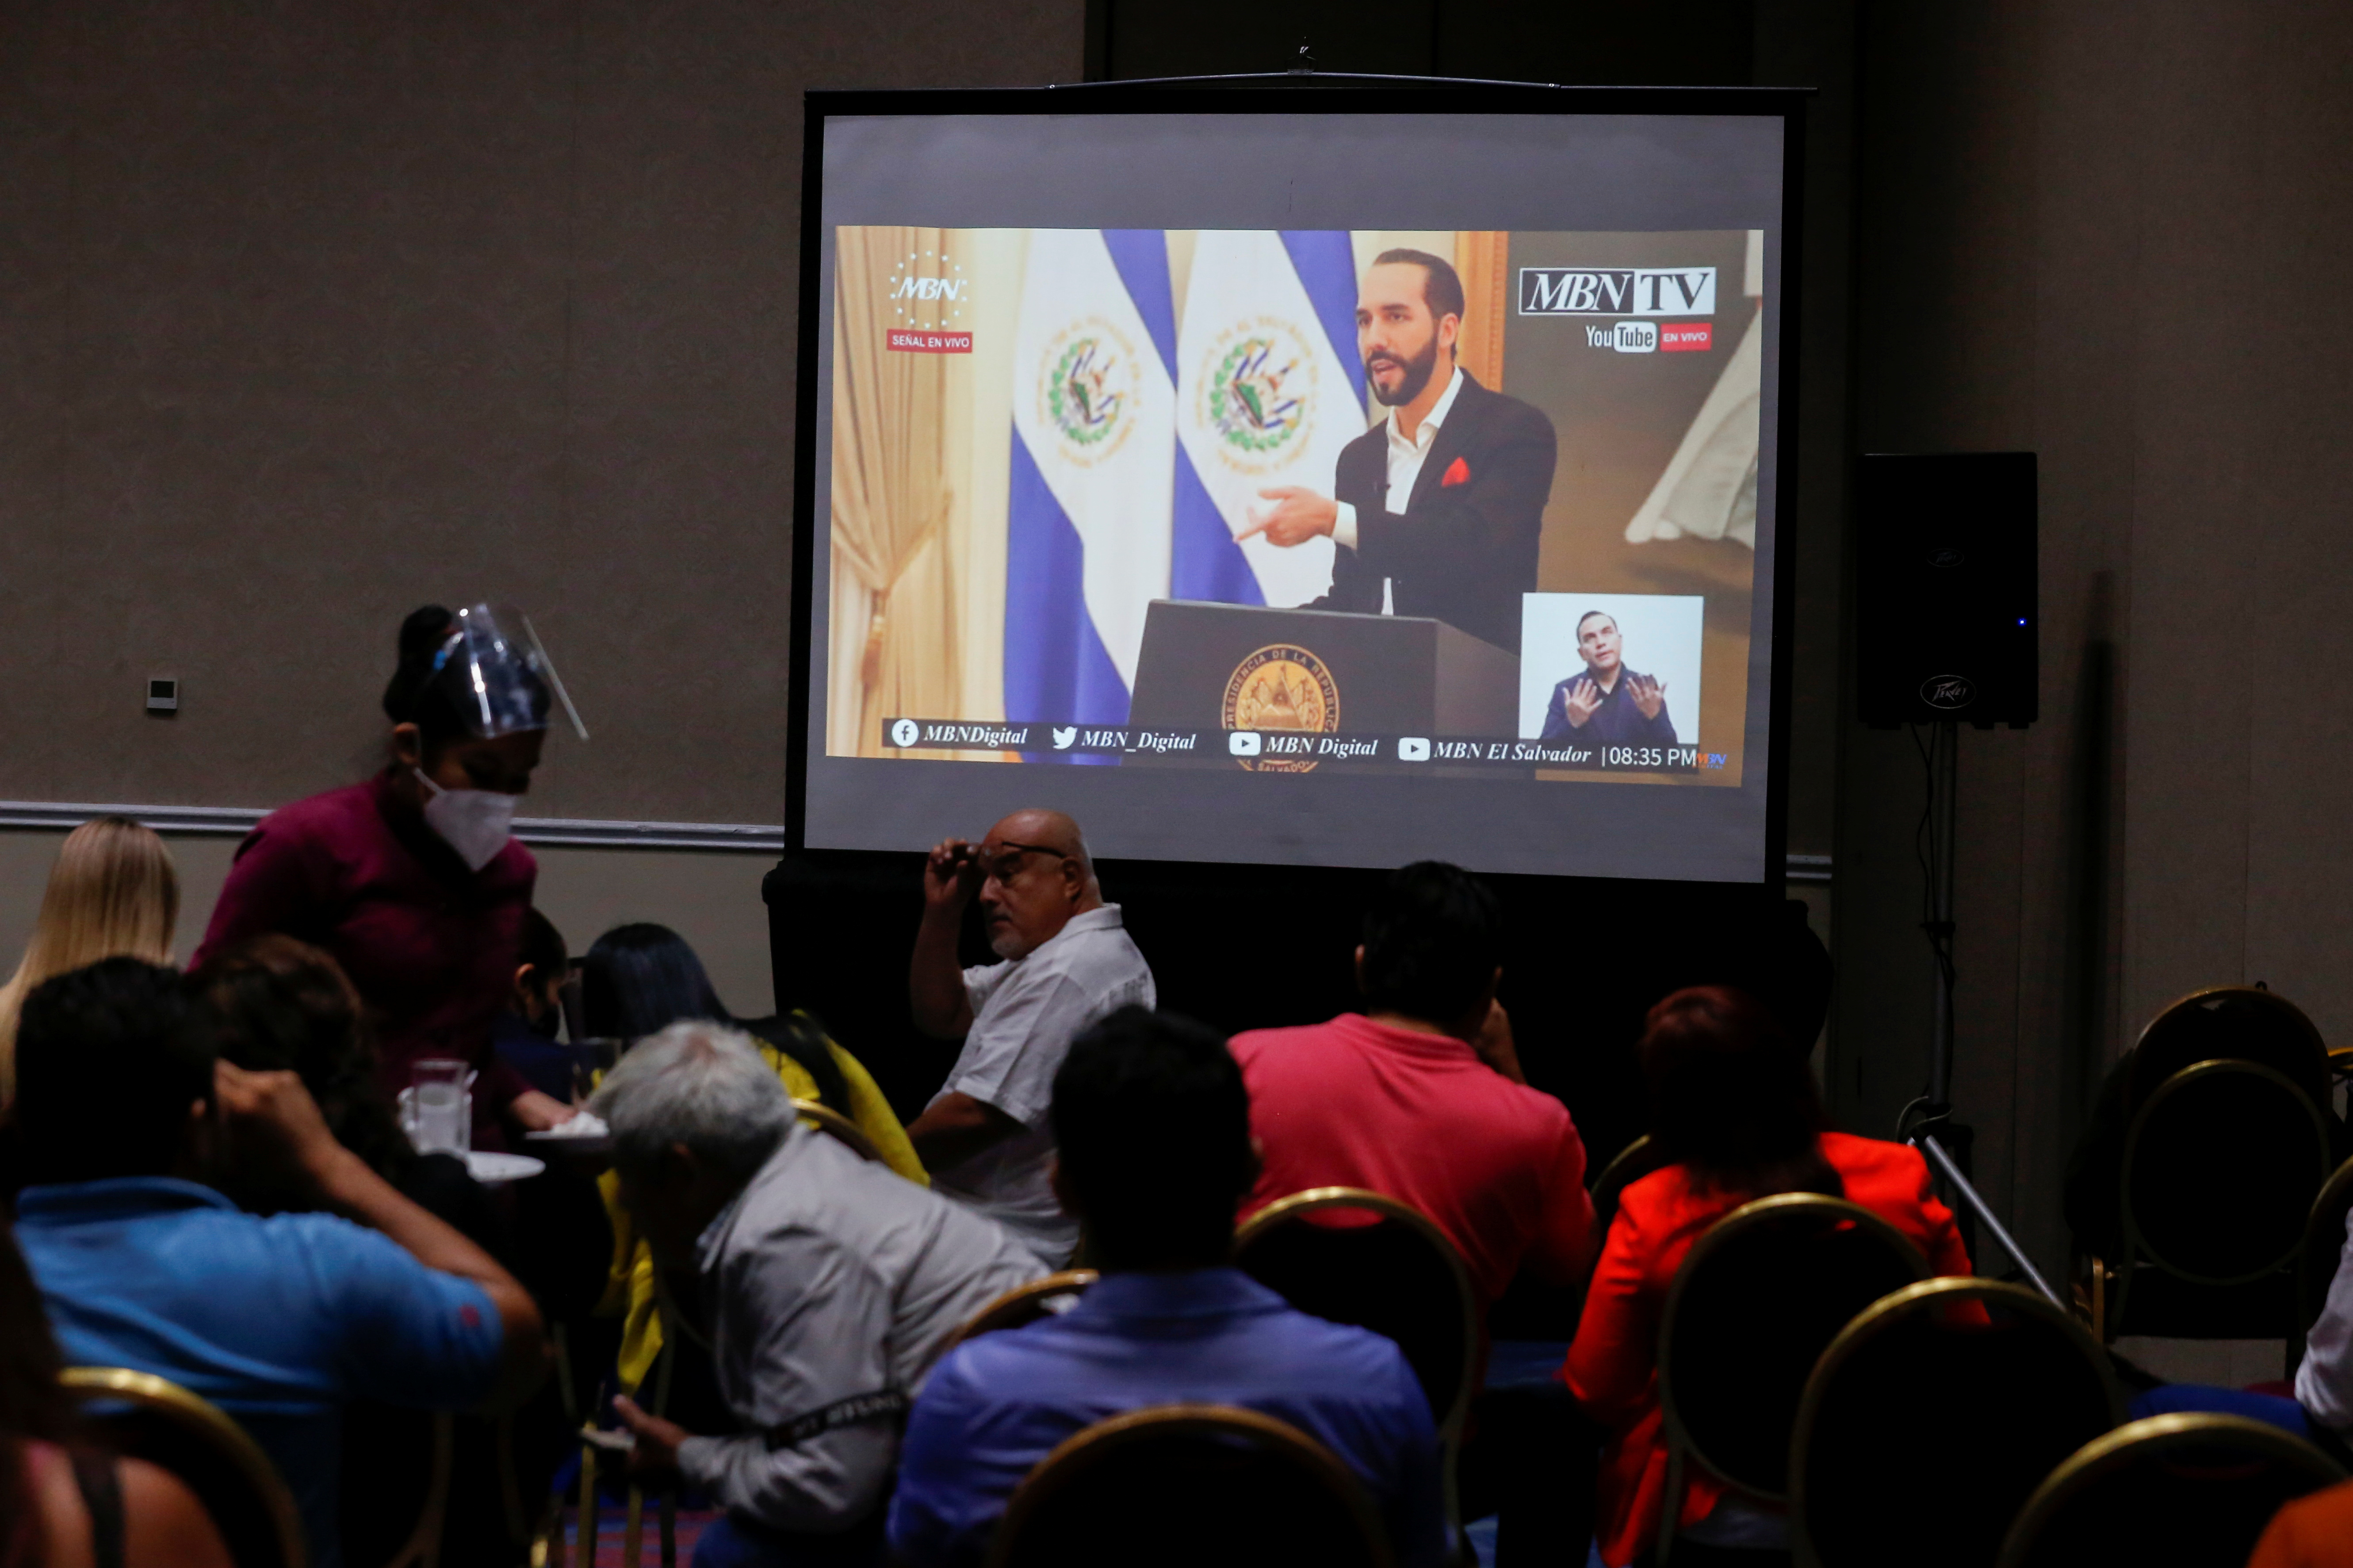 People watch El Salvador President Nayib Bukele on an online transmission during a Bitcoin investment event, in San Salvador, El Salvador June 24, 2021. REUTERS/Jose Cabezas